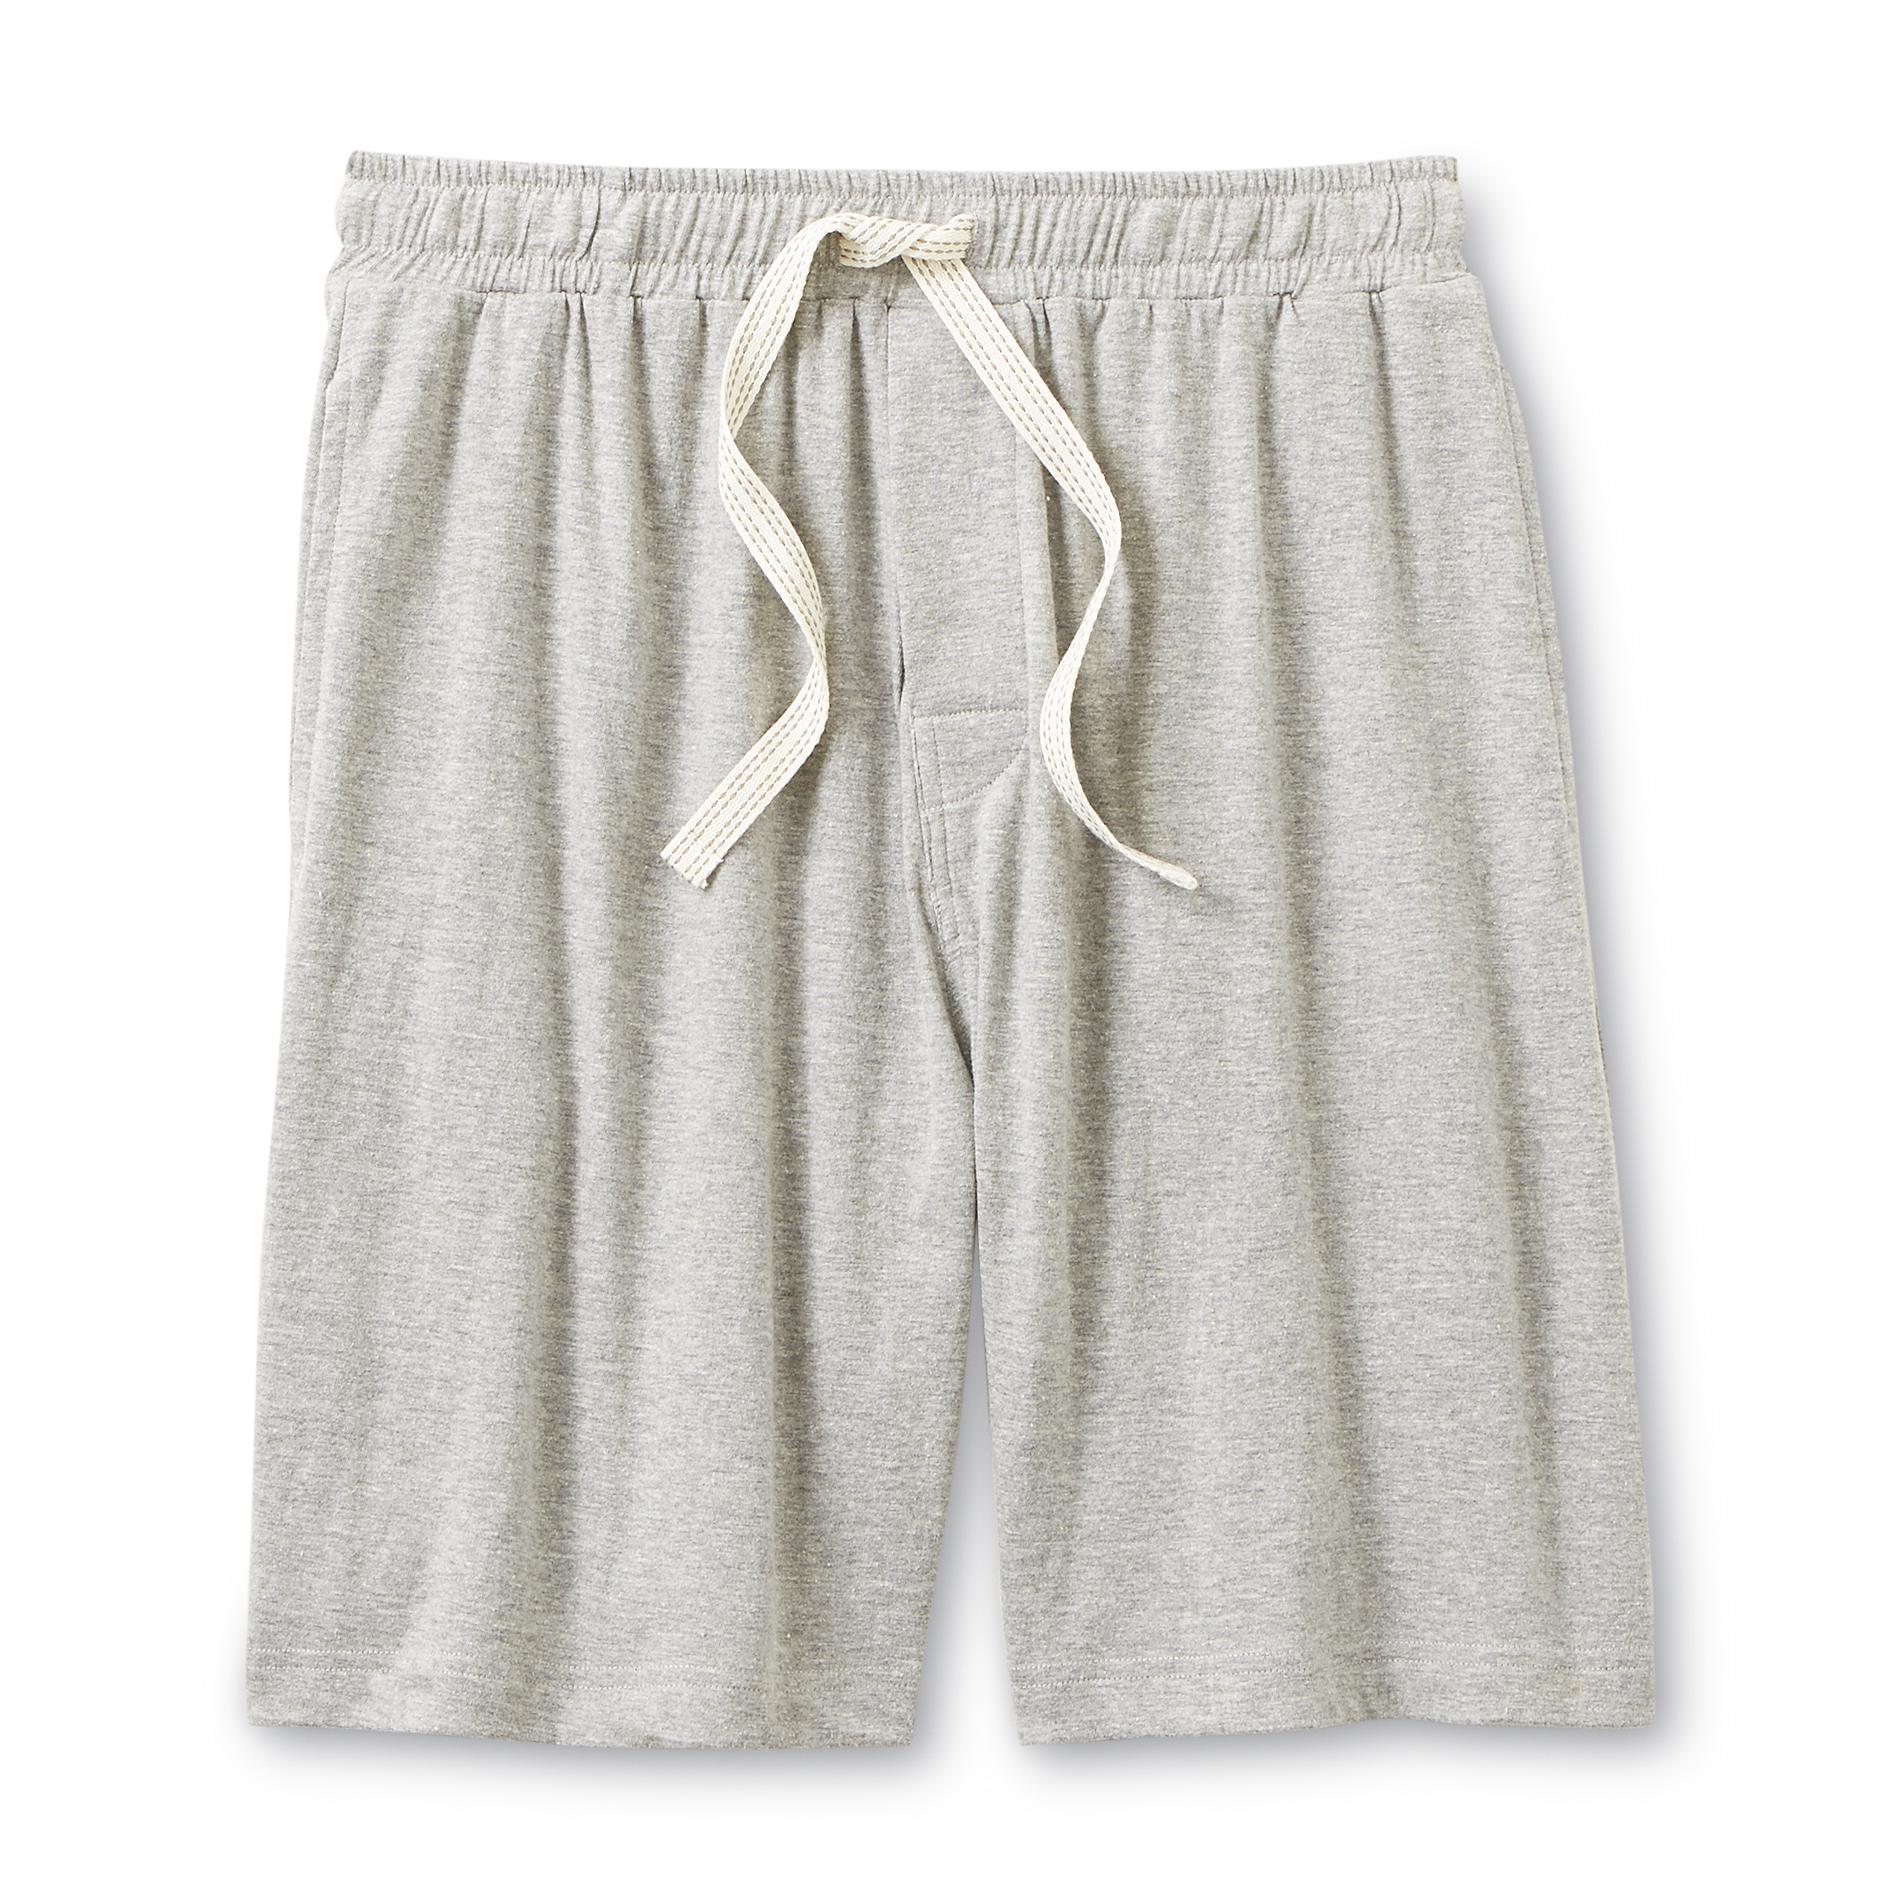 Joe Boxer Men's Drawstring Knit Shorts